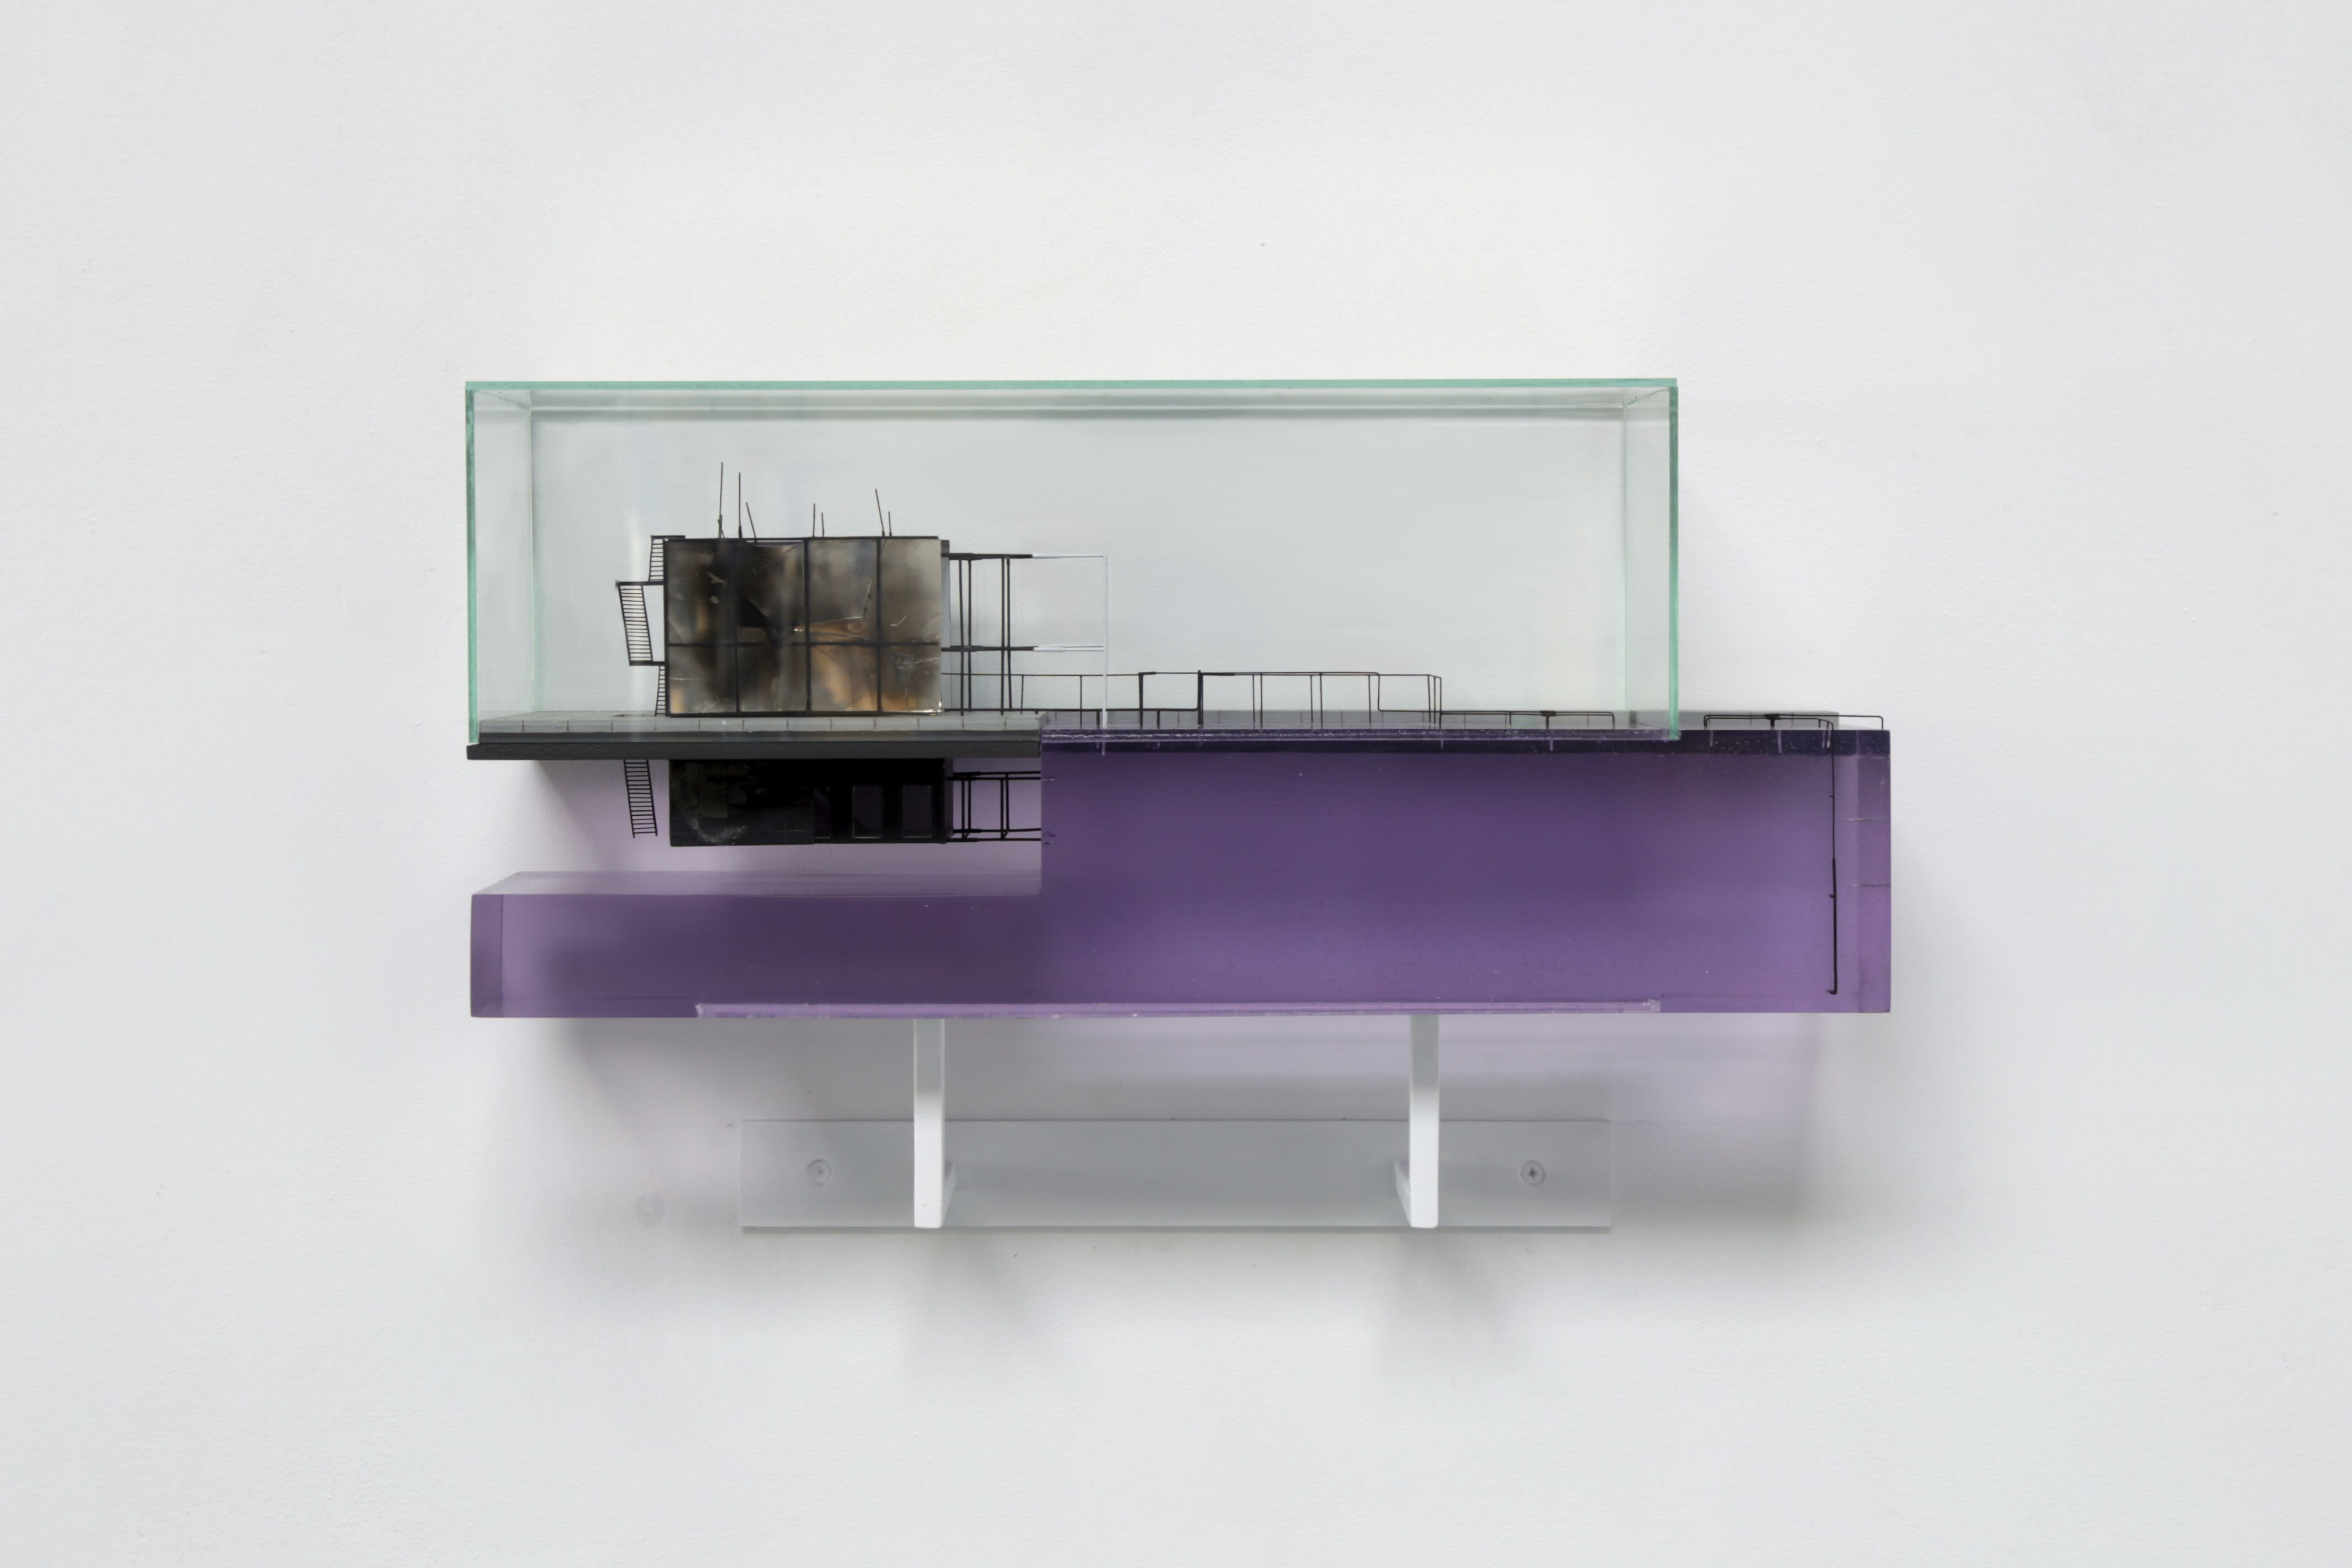 De Kunstmeisjes tippen - Art Rotterdam